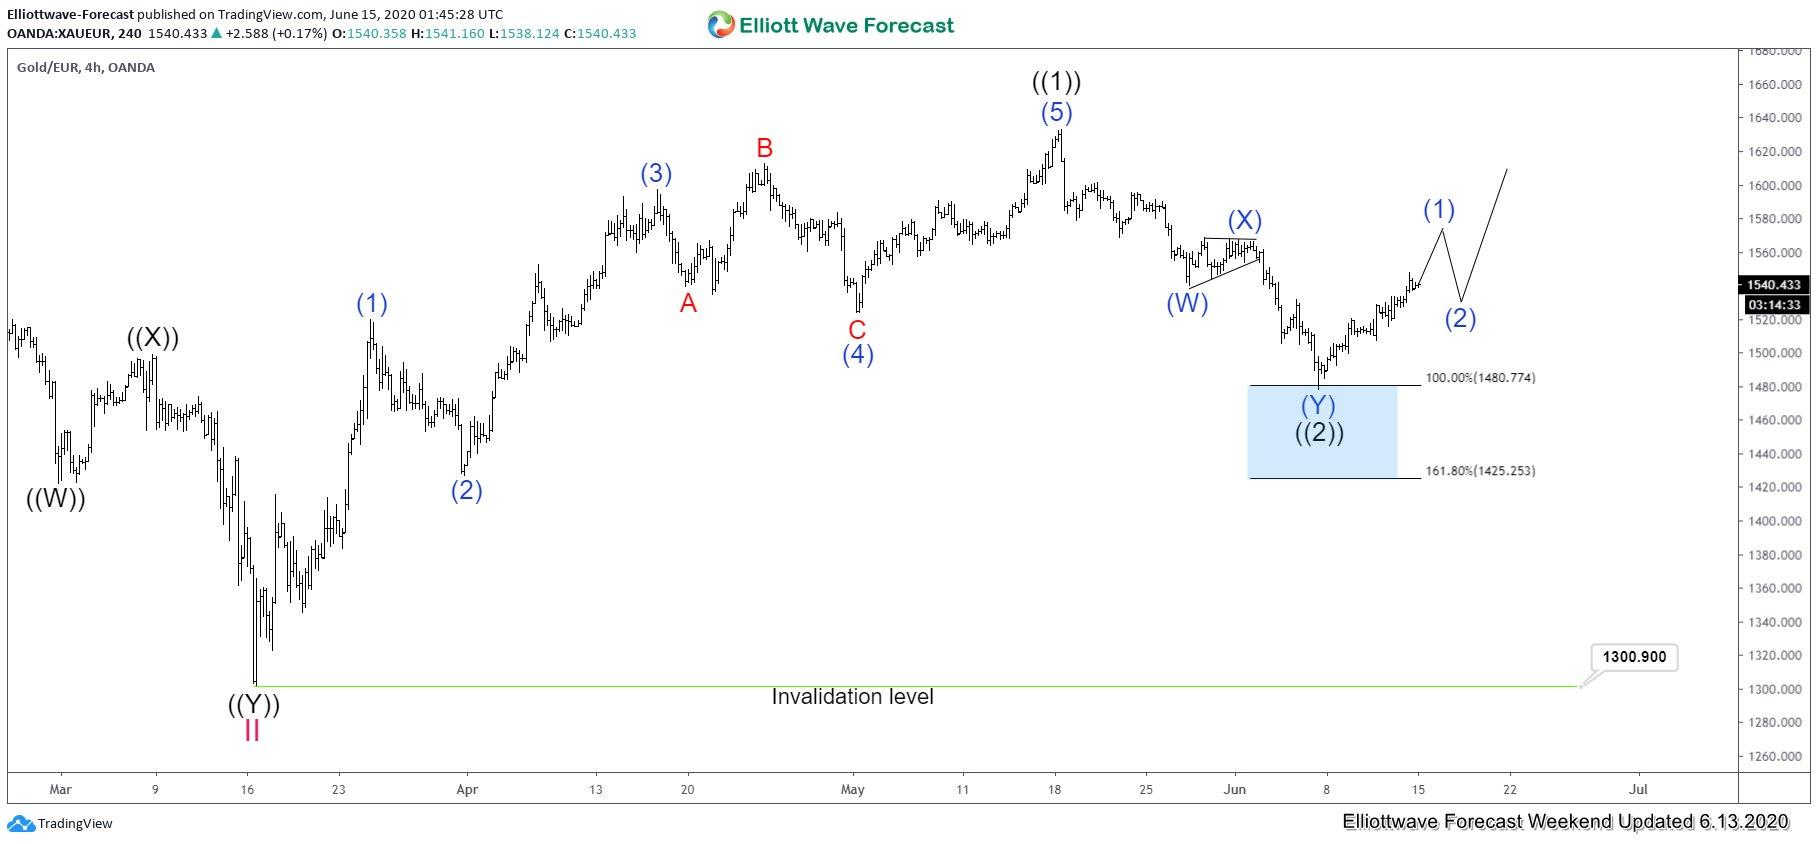 Gold Against Euro Dollar (XAUEUR) Ended Correction